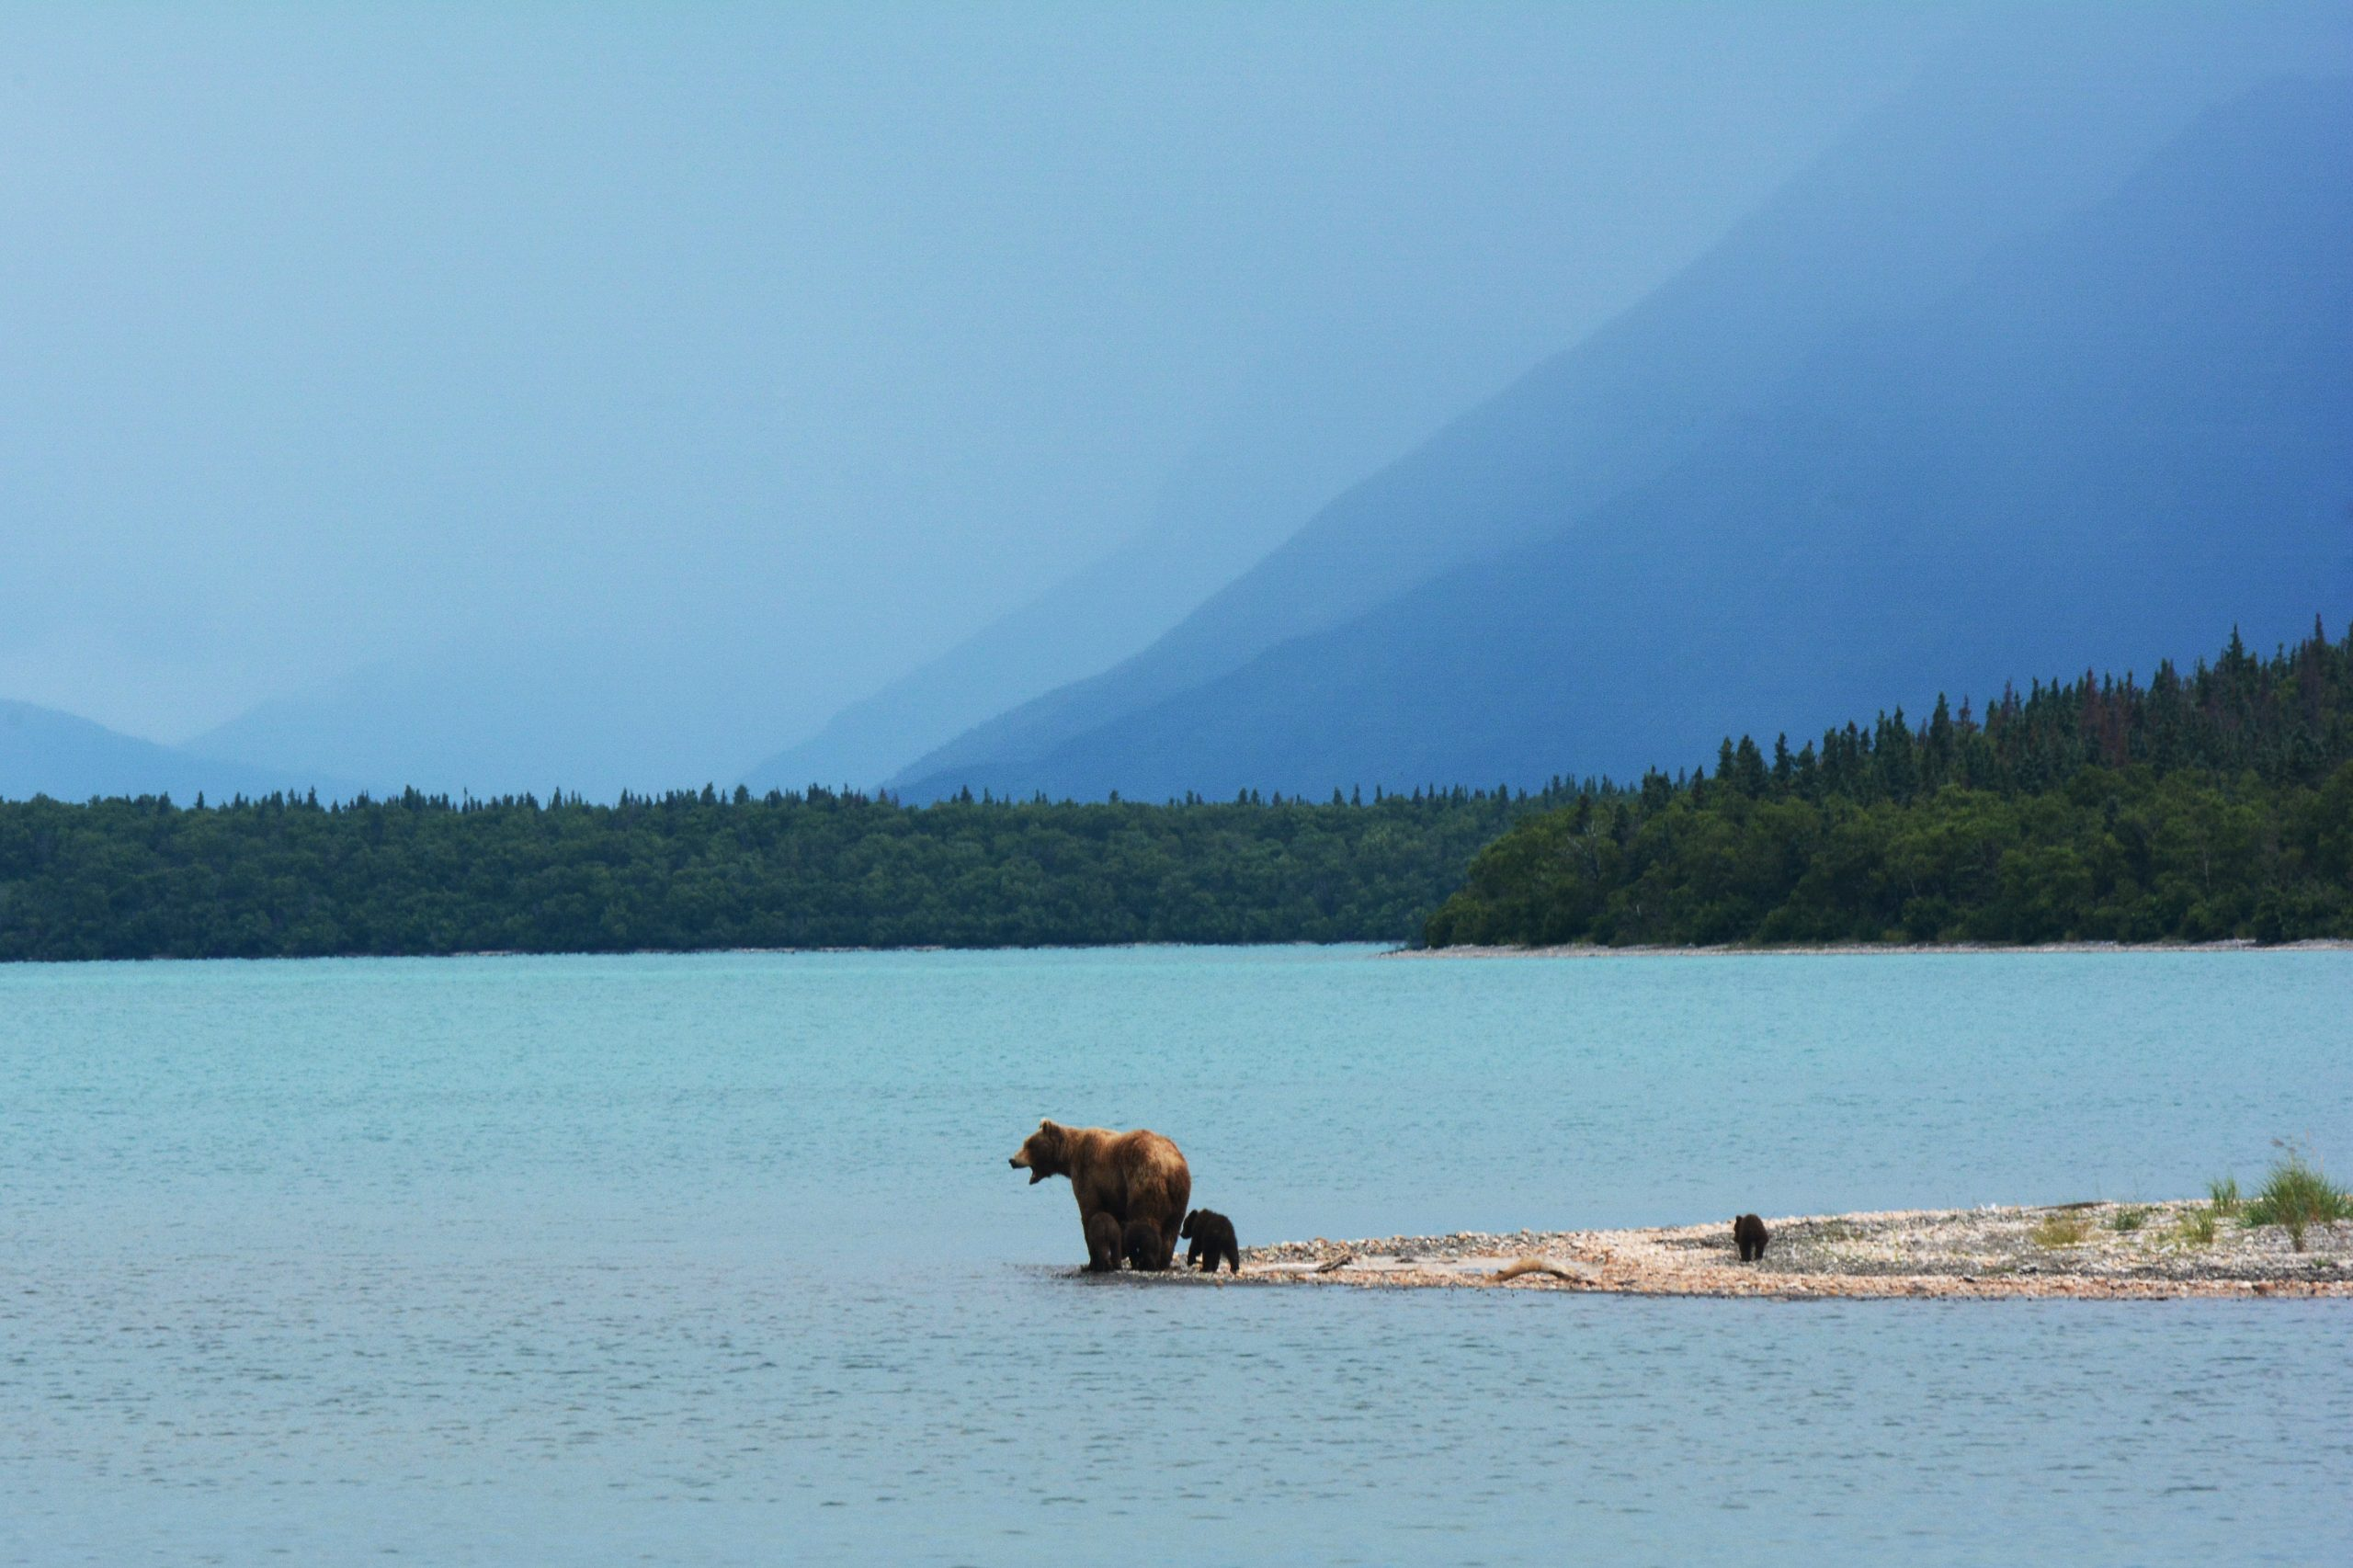 Björnfamilj i Alaska